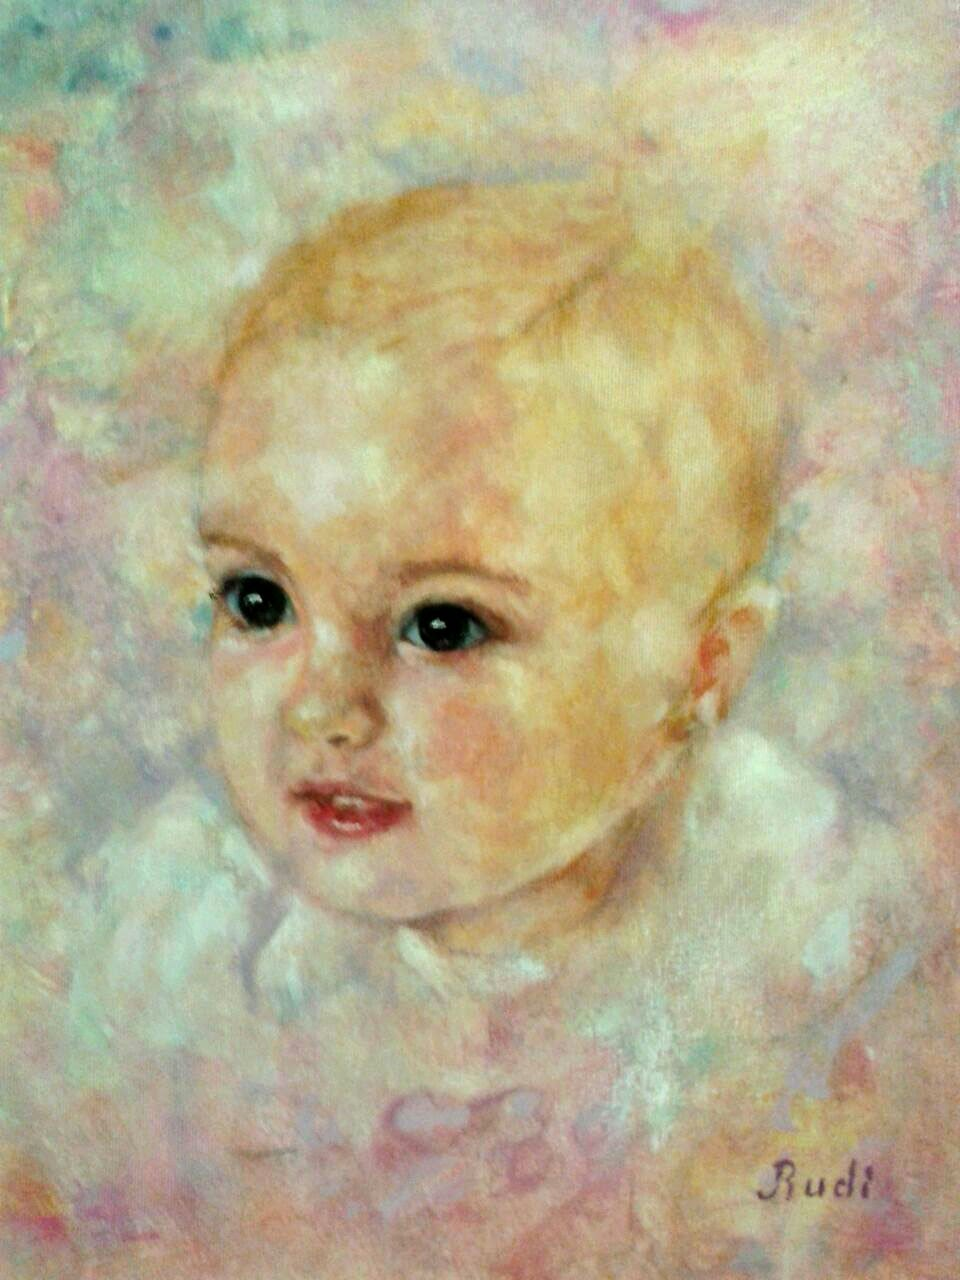 Retrato niña surrealista realizado por pintora Rudi.